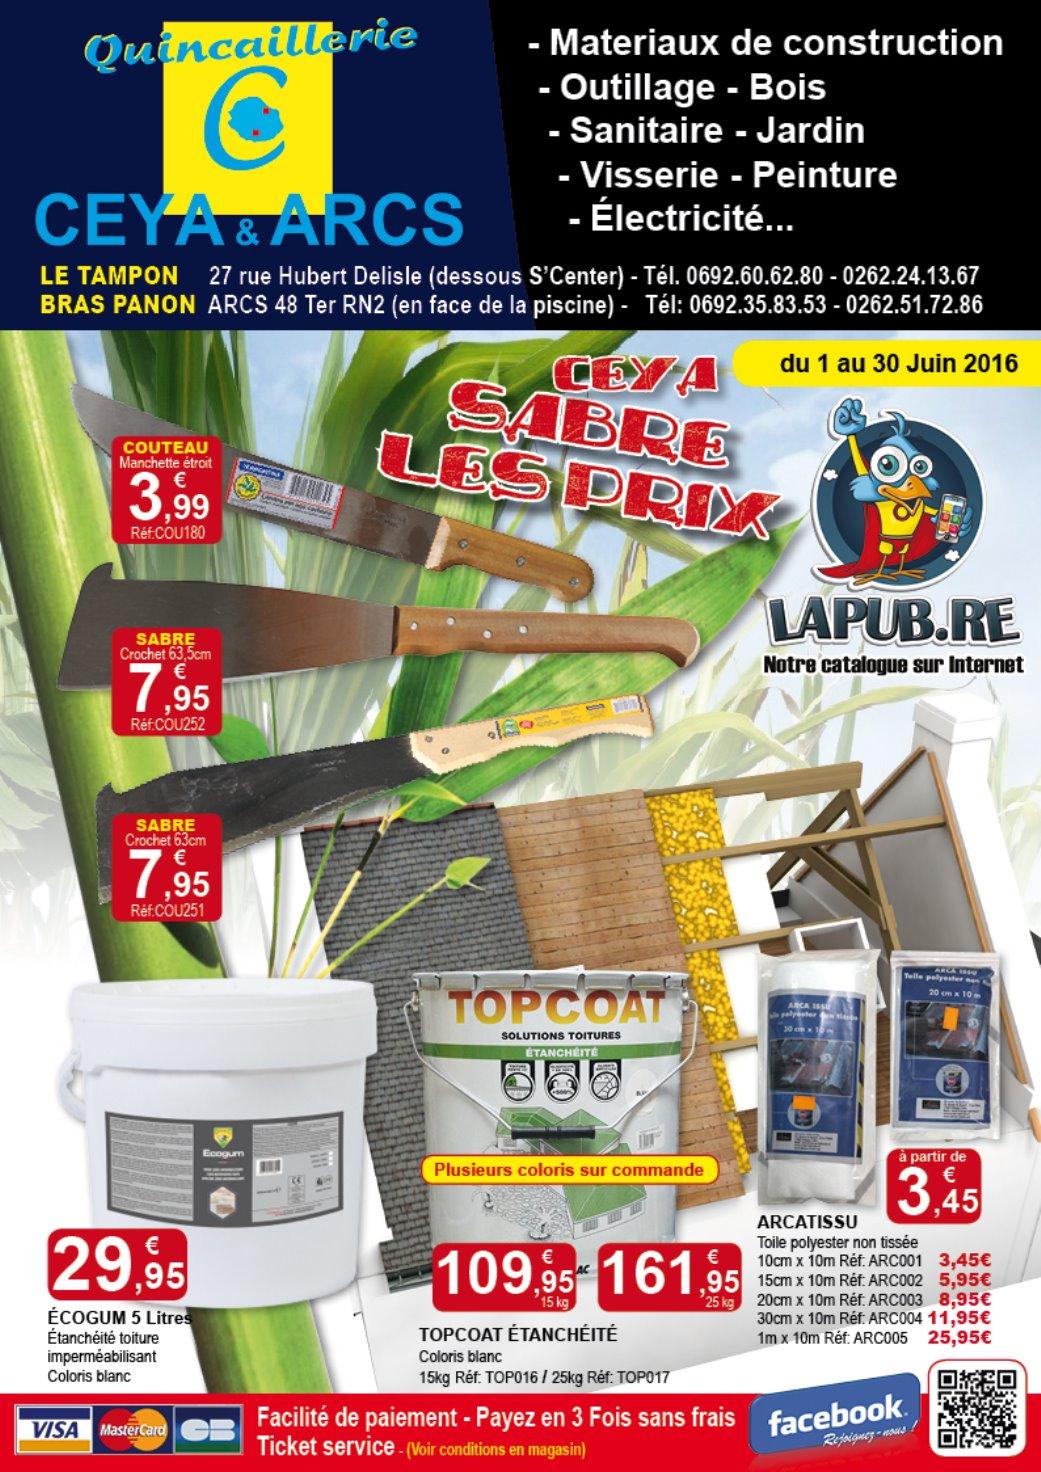 Lapub.re - Prospectus De Quincaillerie Ceya - Ceya Sabre Les ... tout Arcatissu